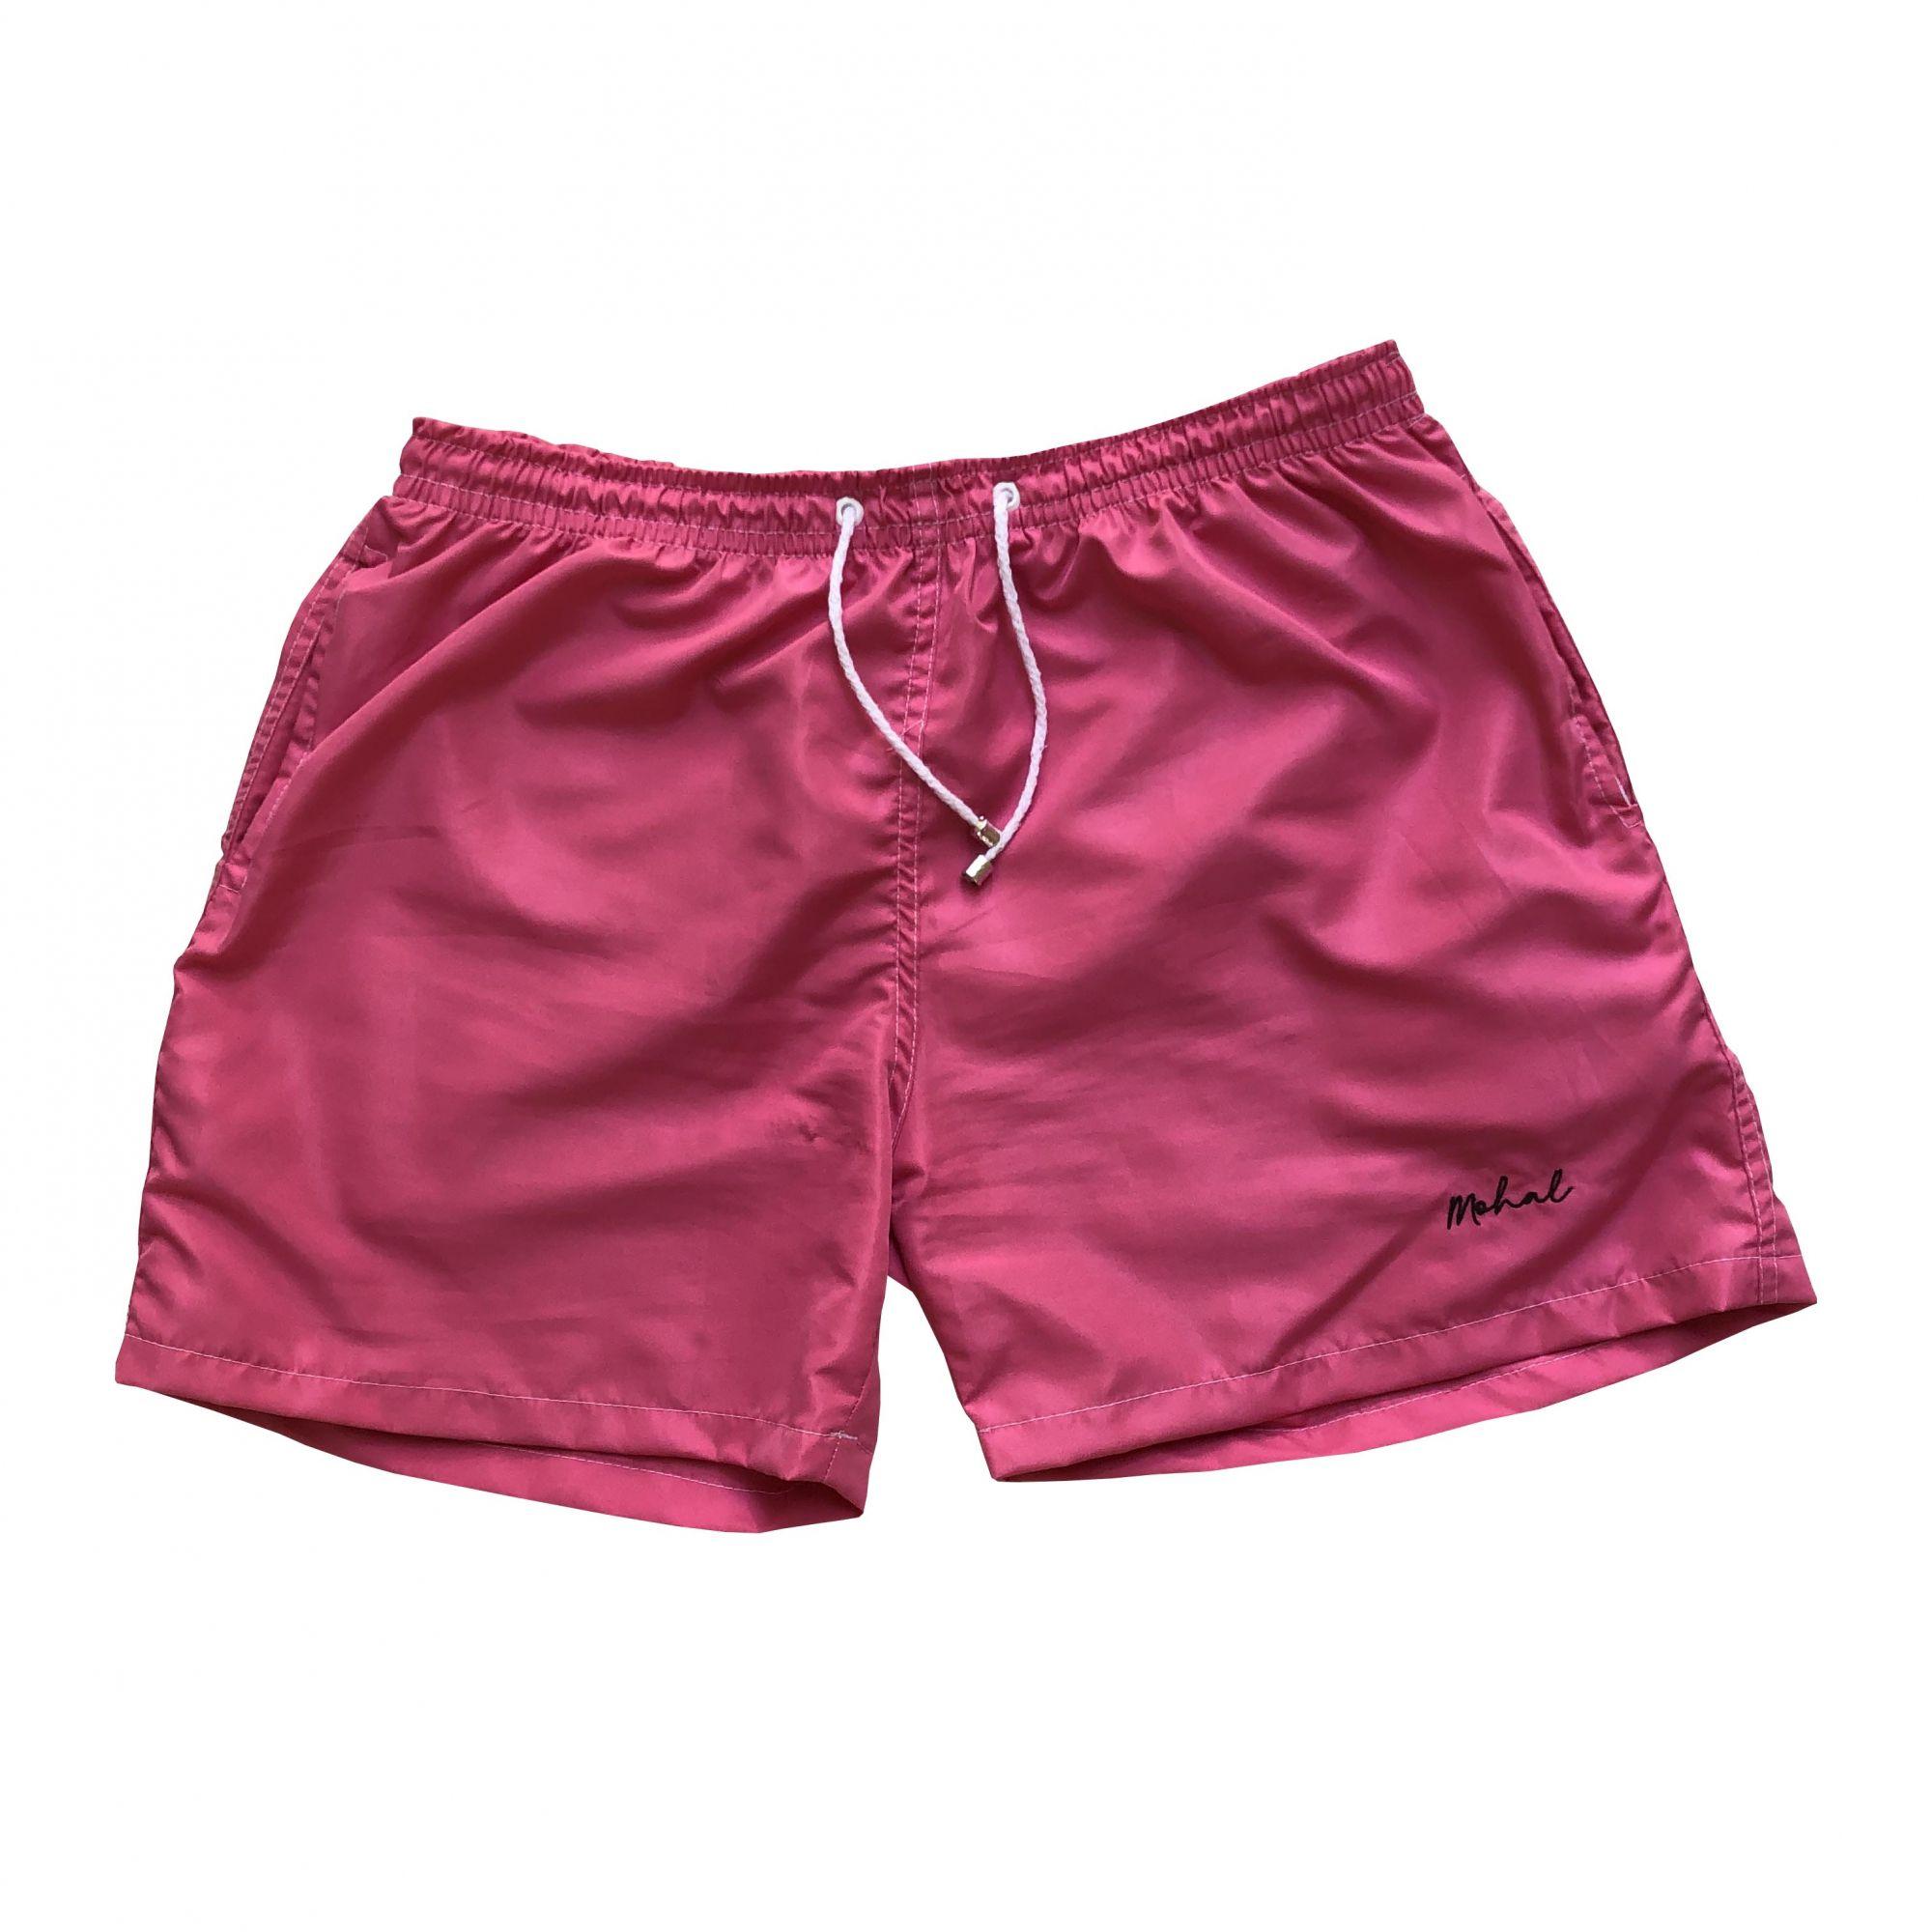 c7e6f577cb41f Summer Short Pink Liso - Mohal Wear